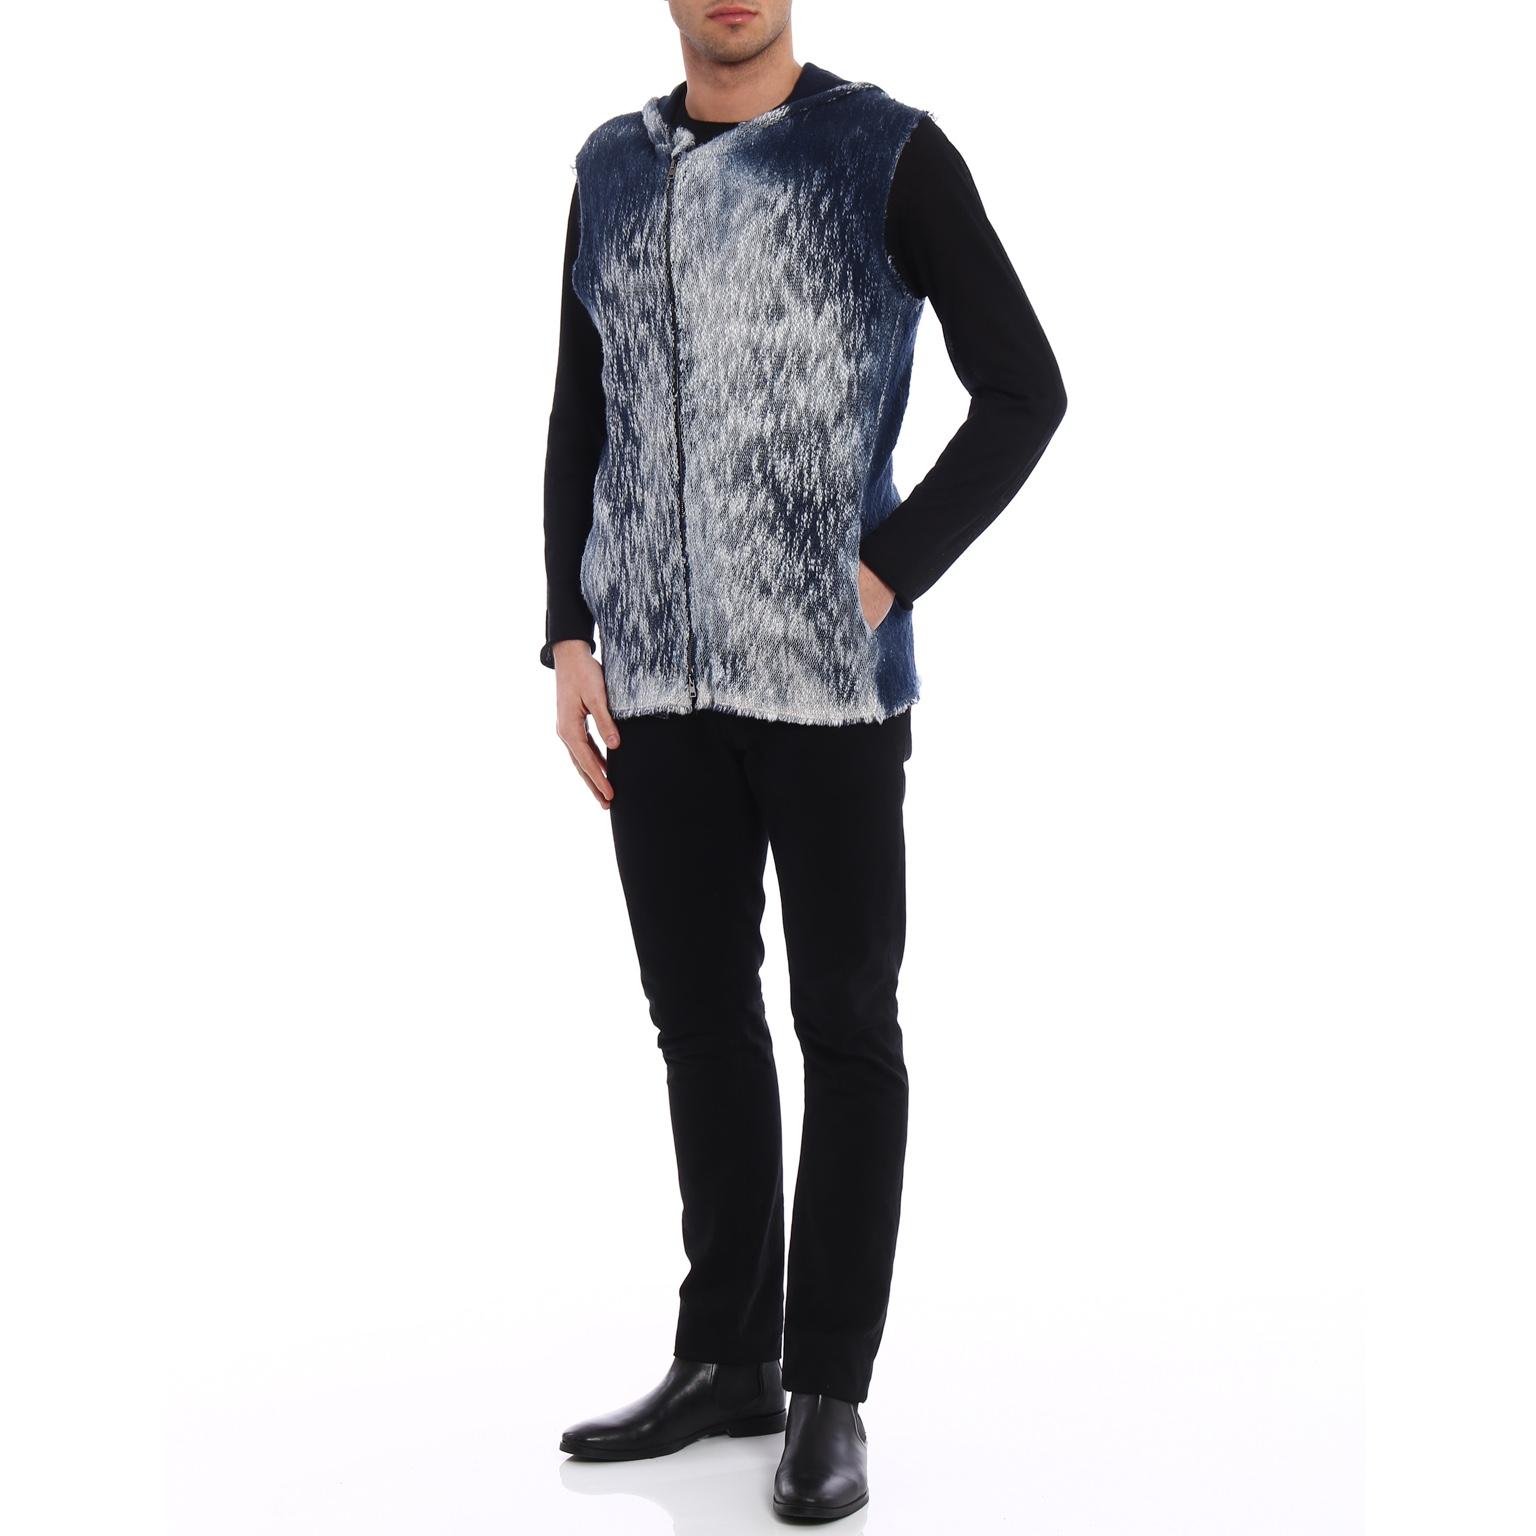 avant-toi-online-cardigans-malfil-cotton-sleeveless-cardigan-00000121358f00s002.jpg